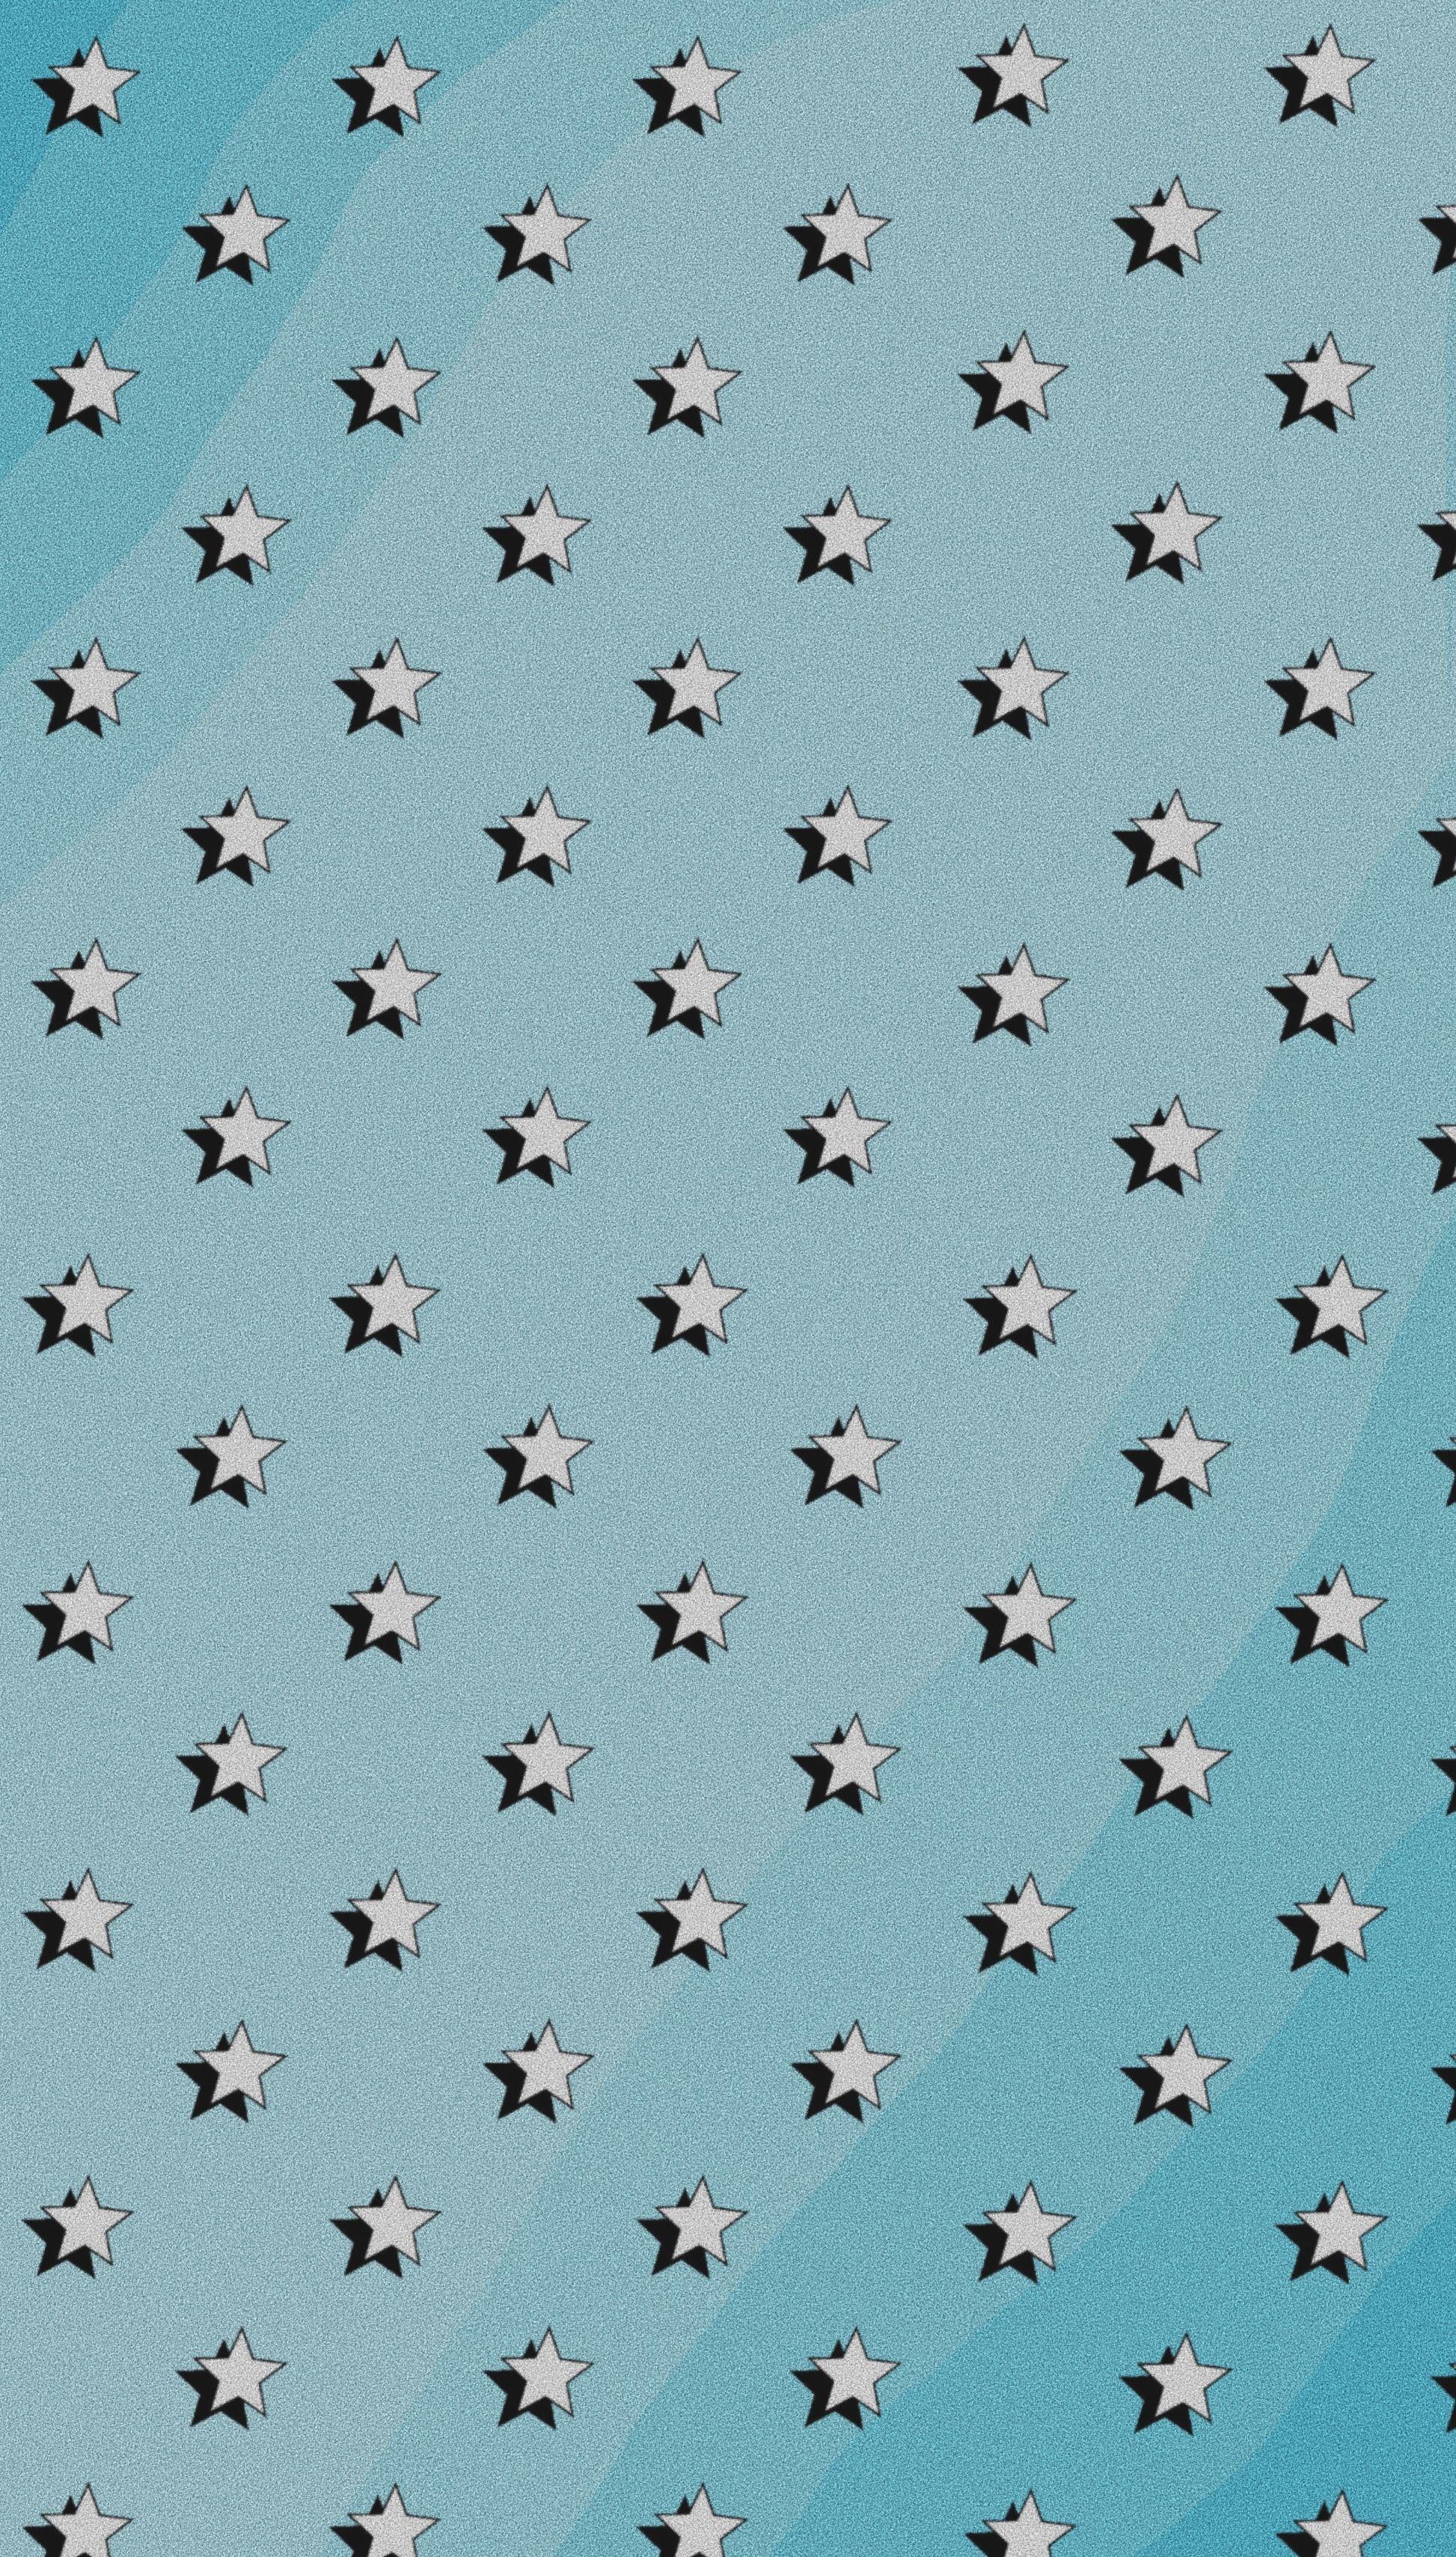 Aesthetic Wallpaper Baby Blue Wallpaper Baby Blue Aesthetic Blue Aesthetic